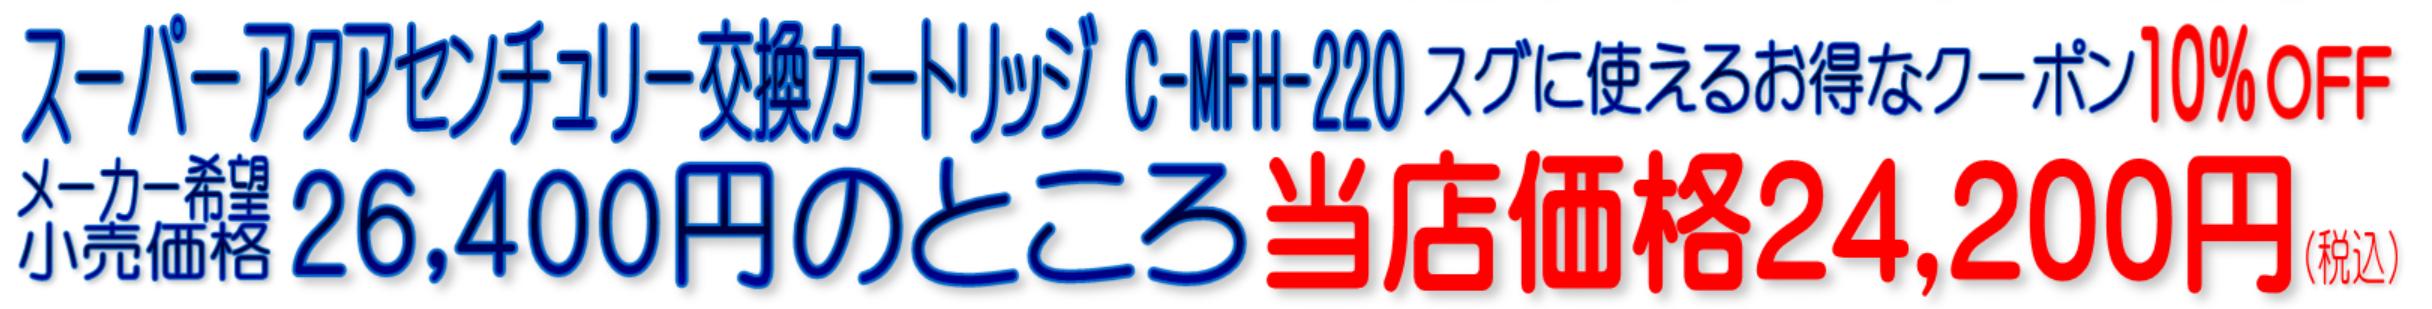 MFH-221 C-MFH-221 スーパーアクアセンチュリー